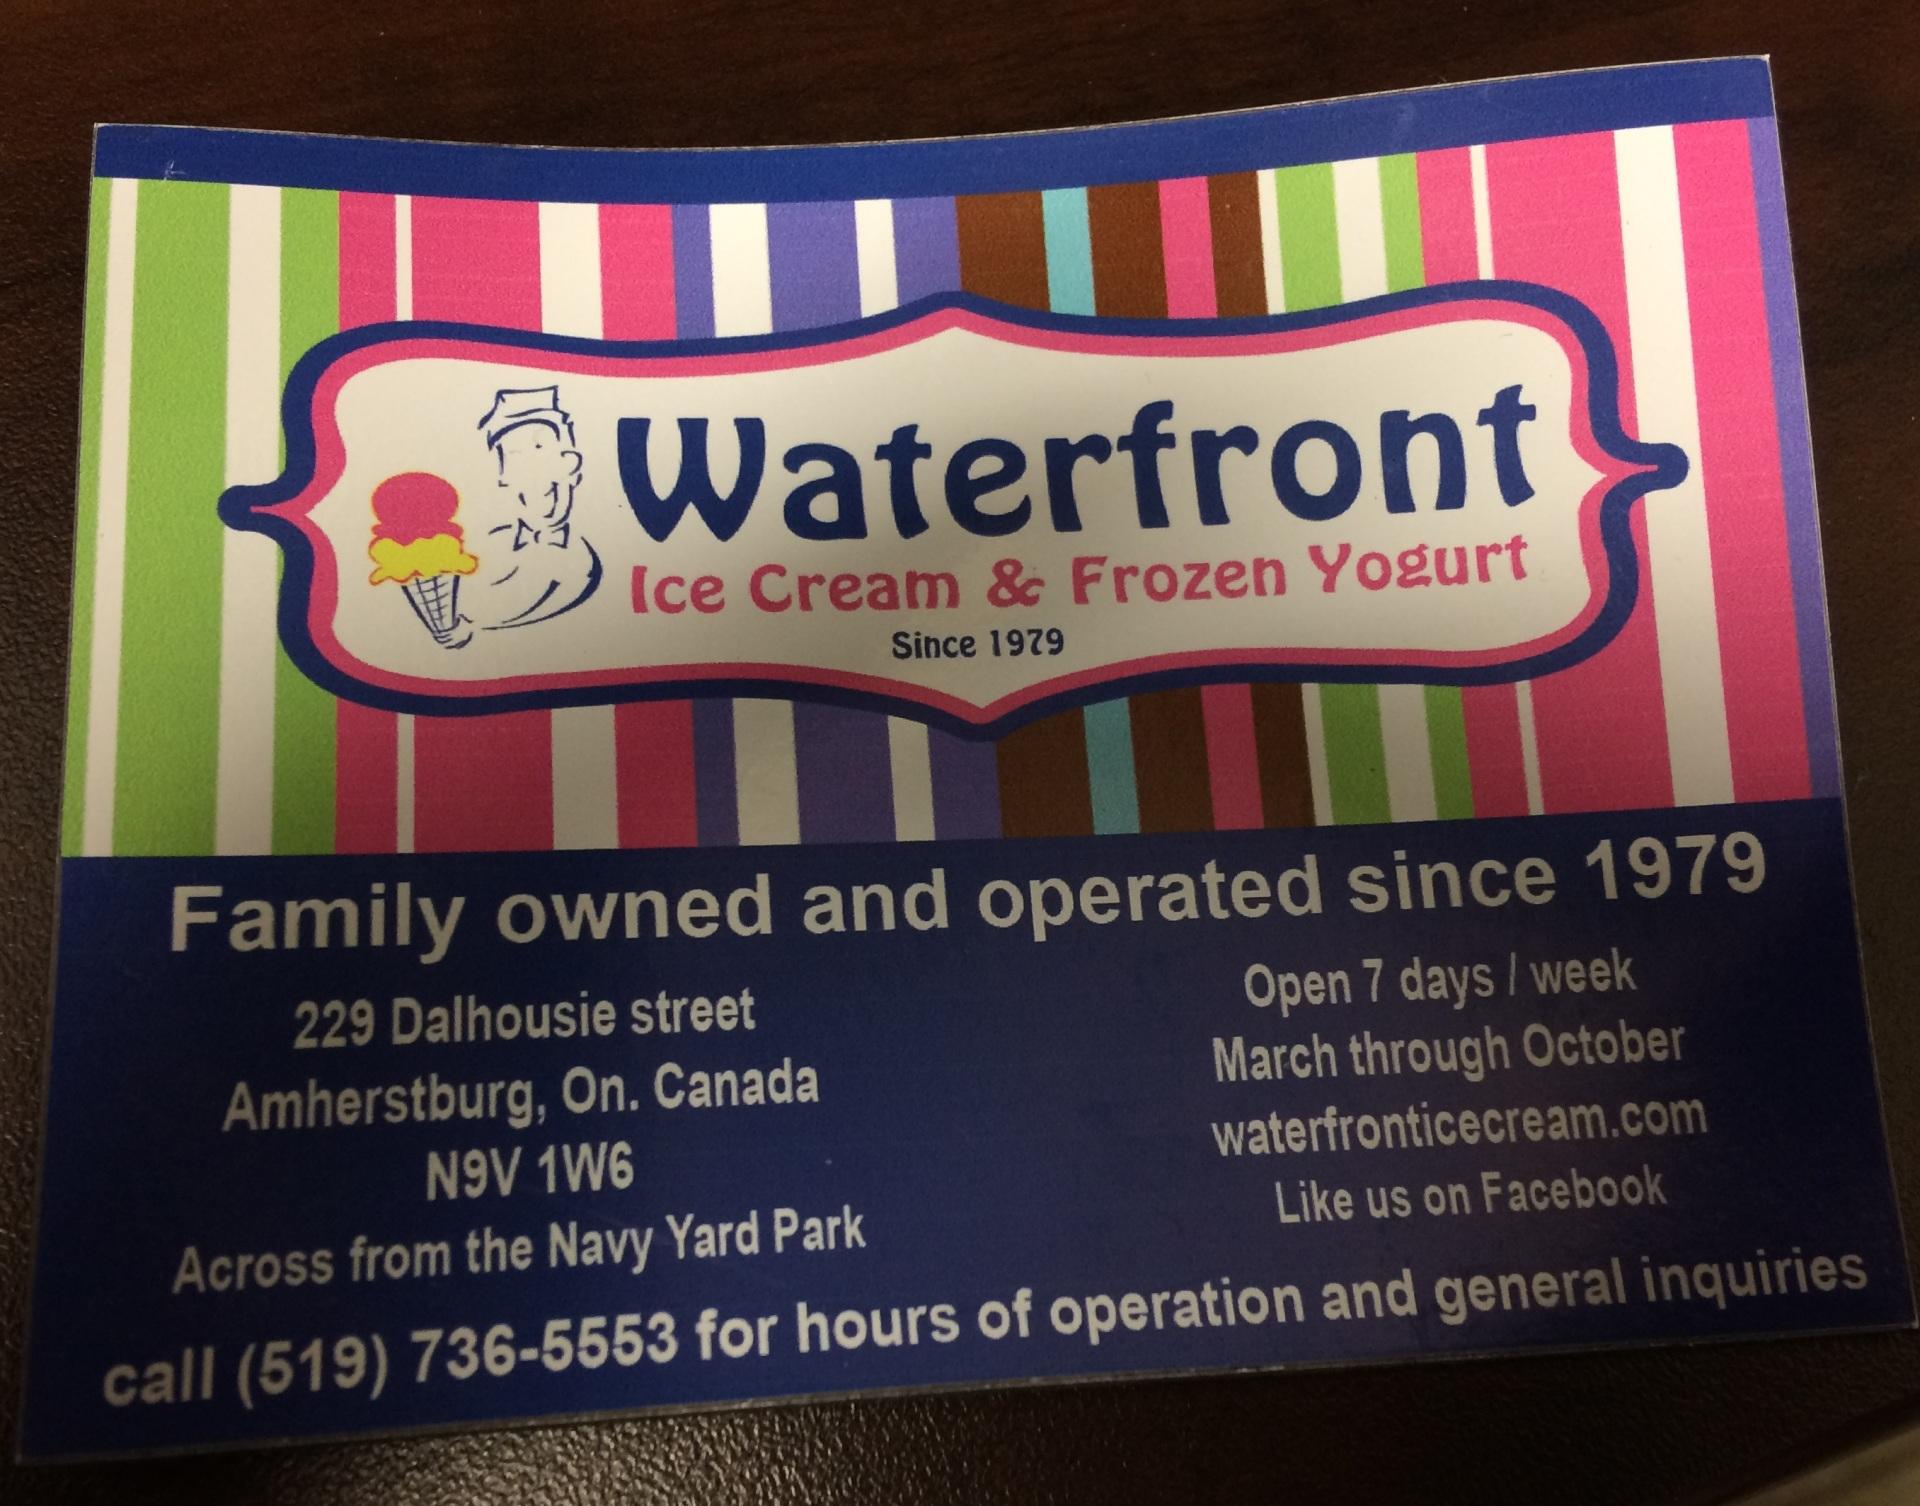 Waterfront Ice Cream & Frozen Yogurt